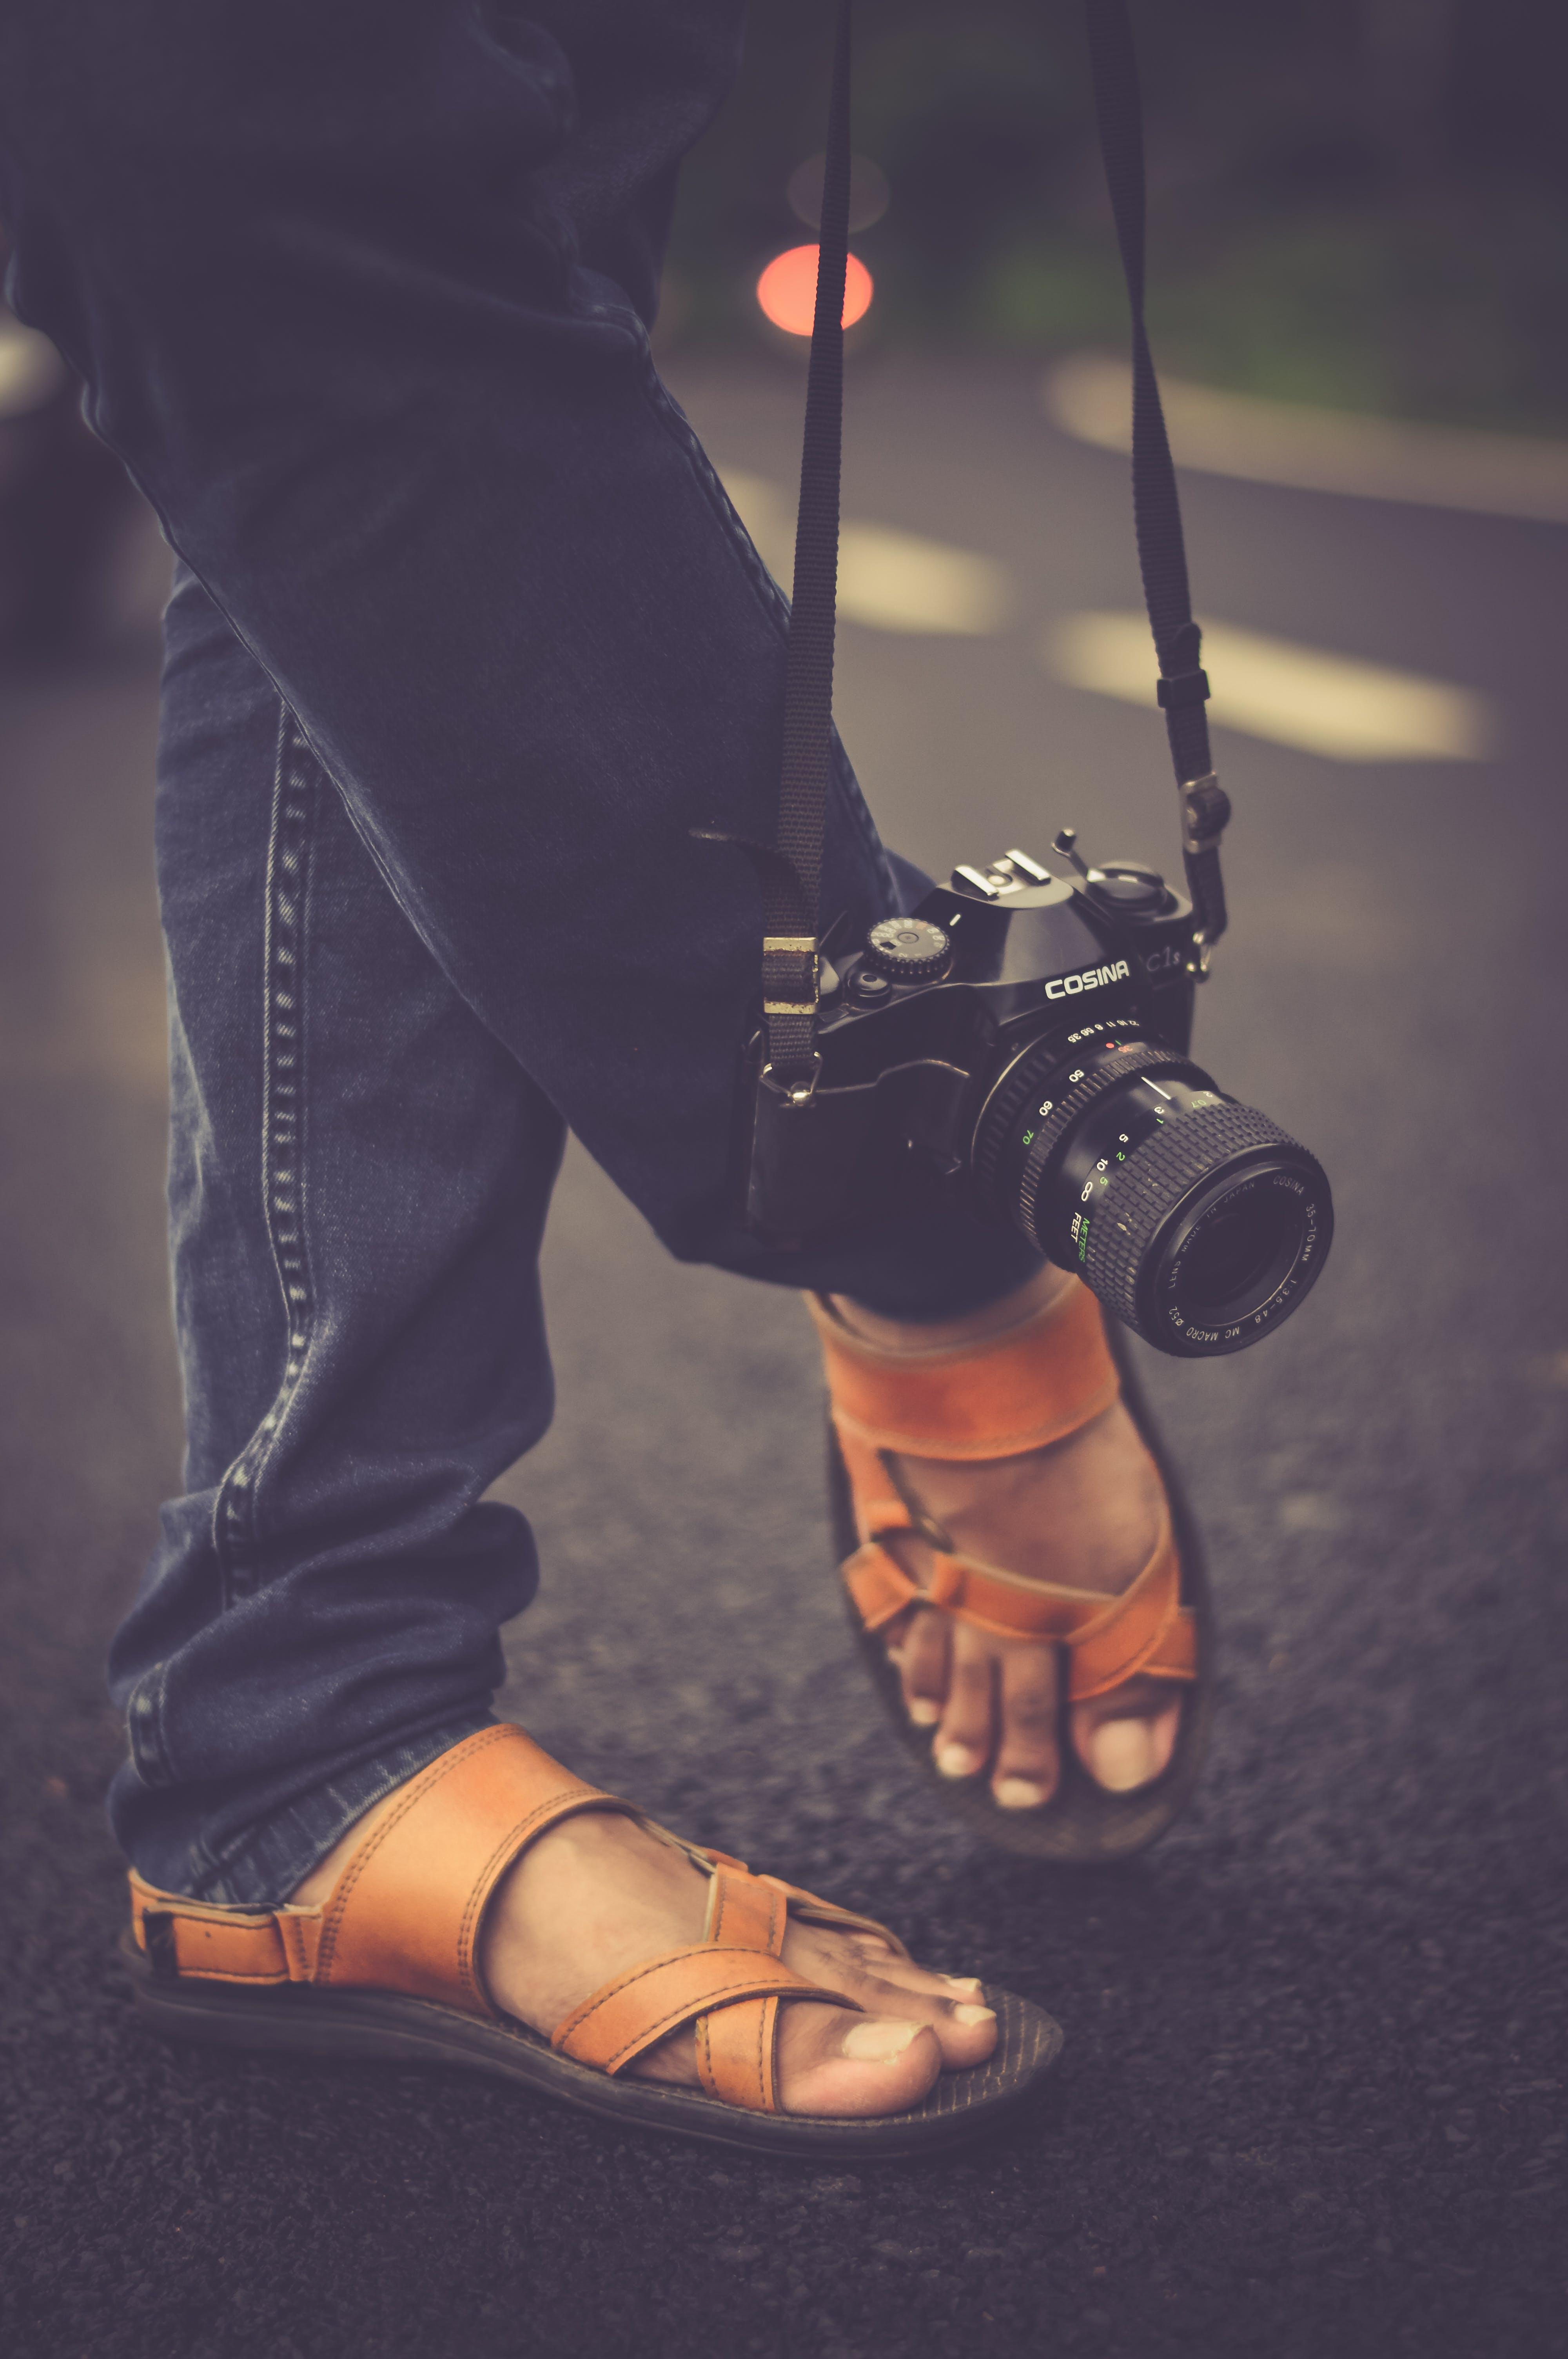 Black Cosina Slr Camera Hanging Beside Foot during Daytime